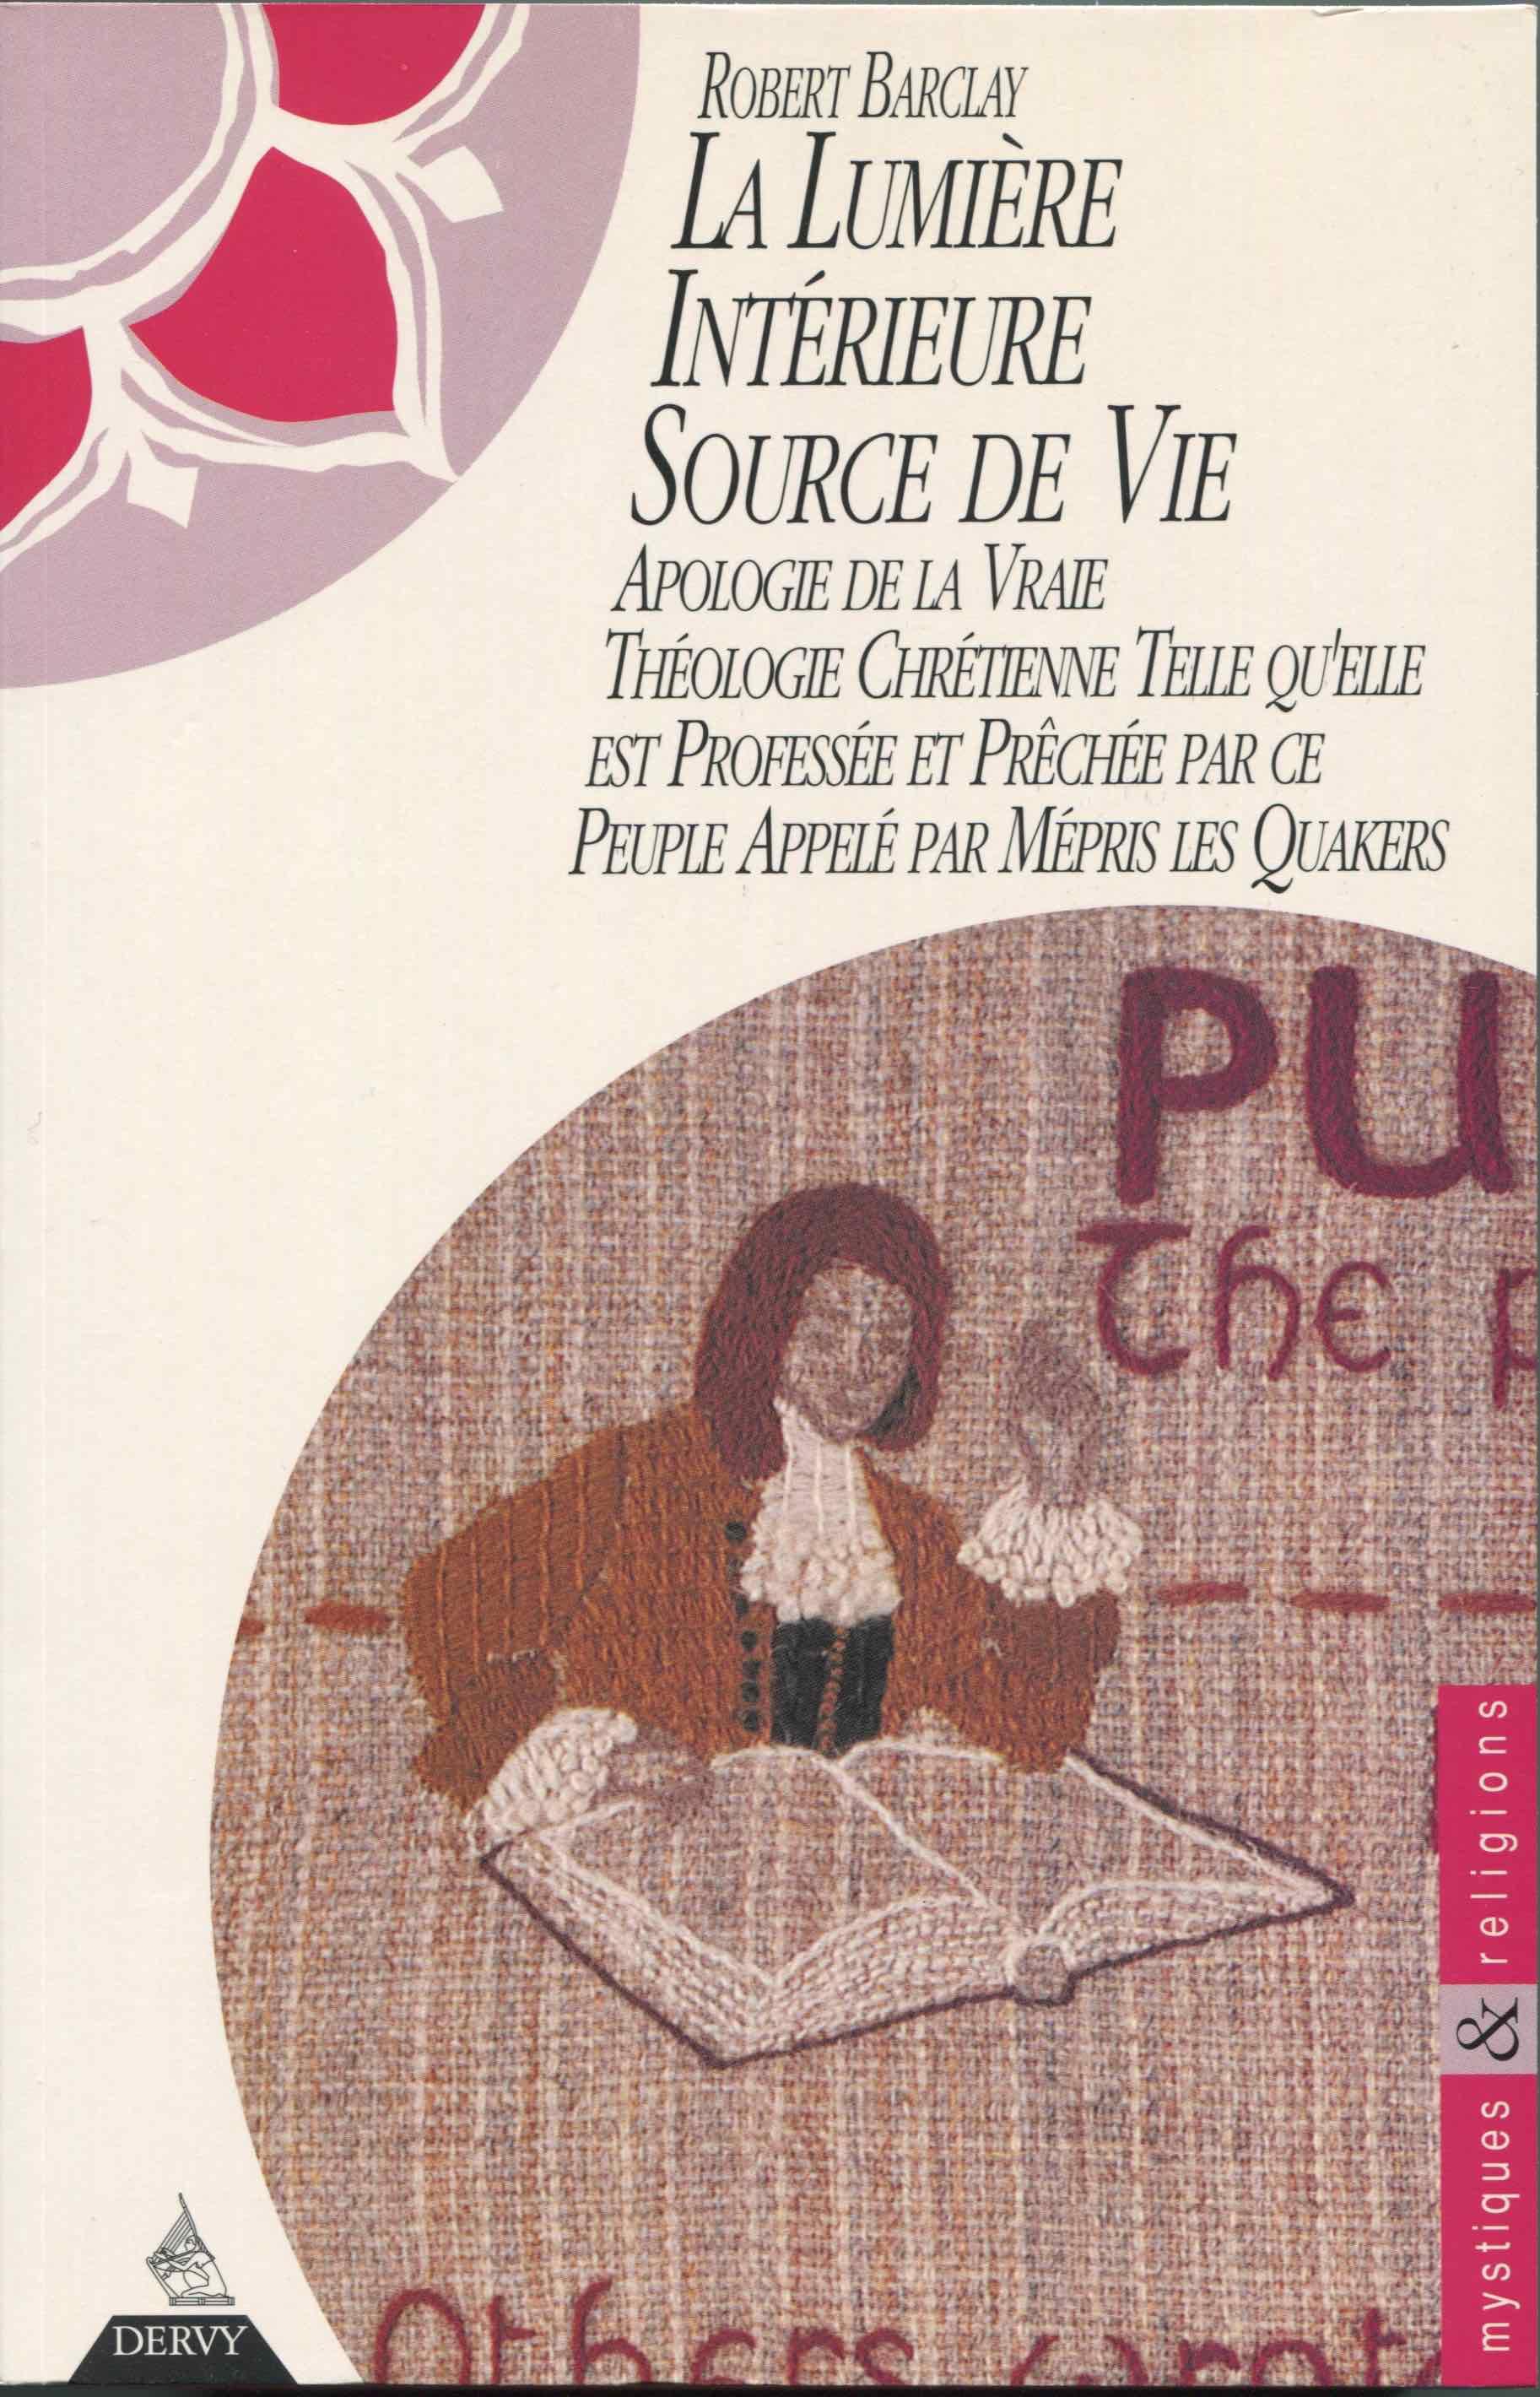 livres Quakers Barclay - livres_Quakers_Barclay